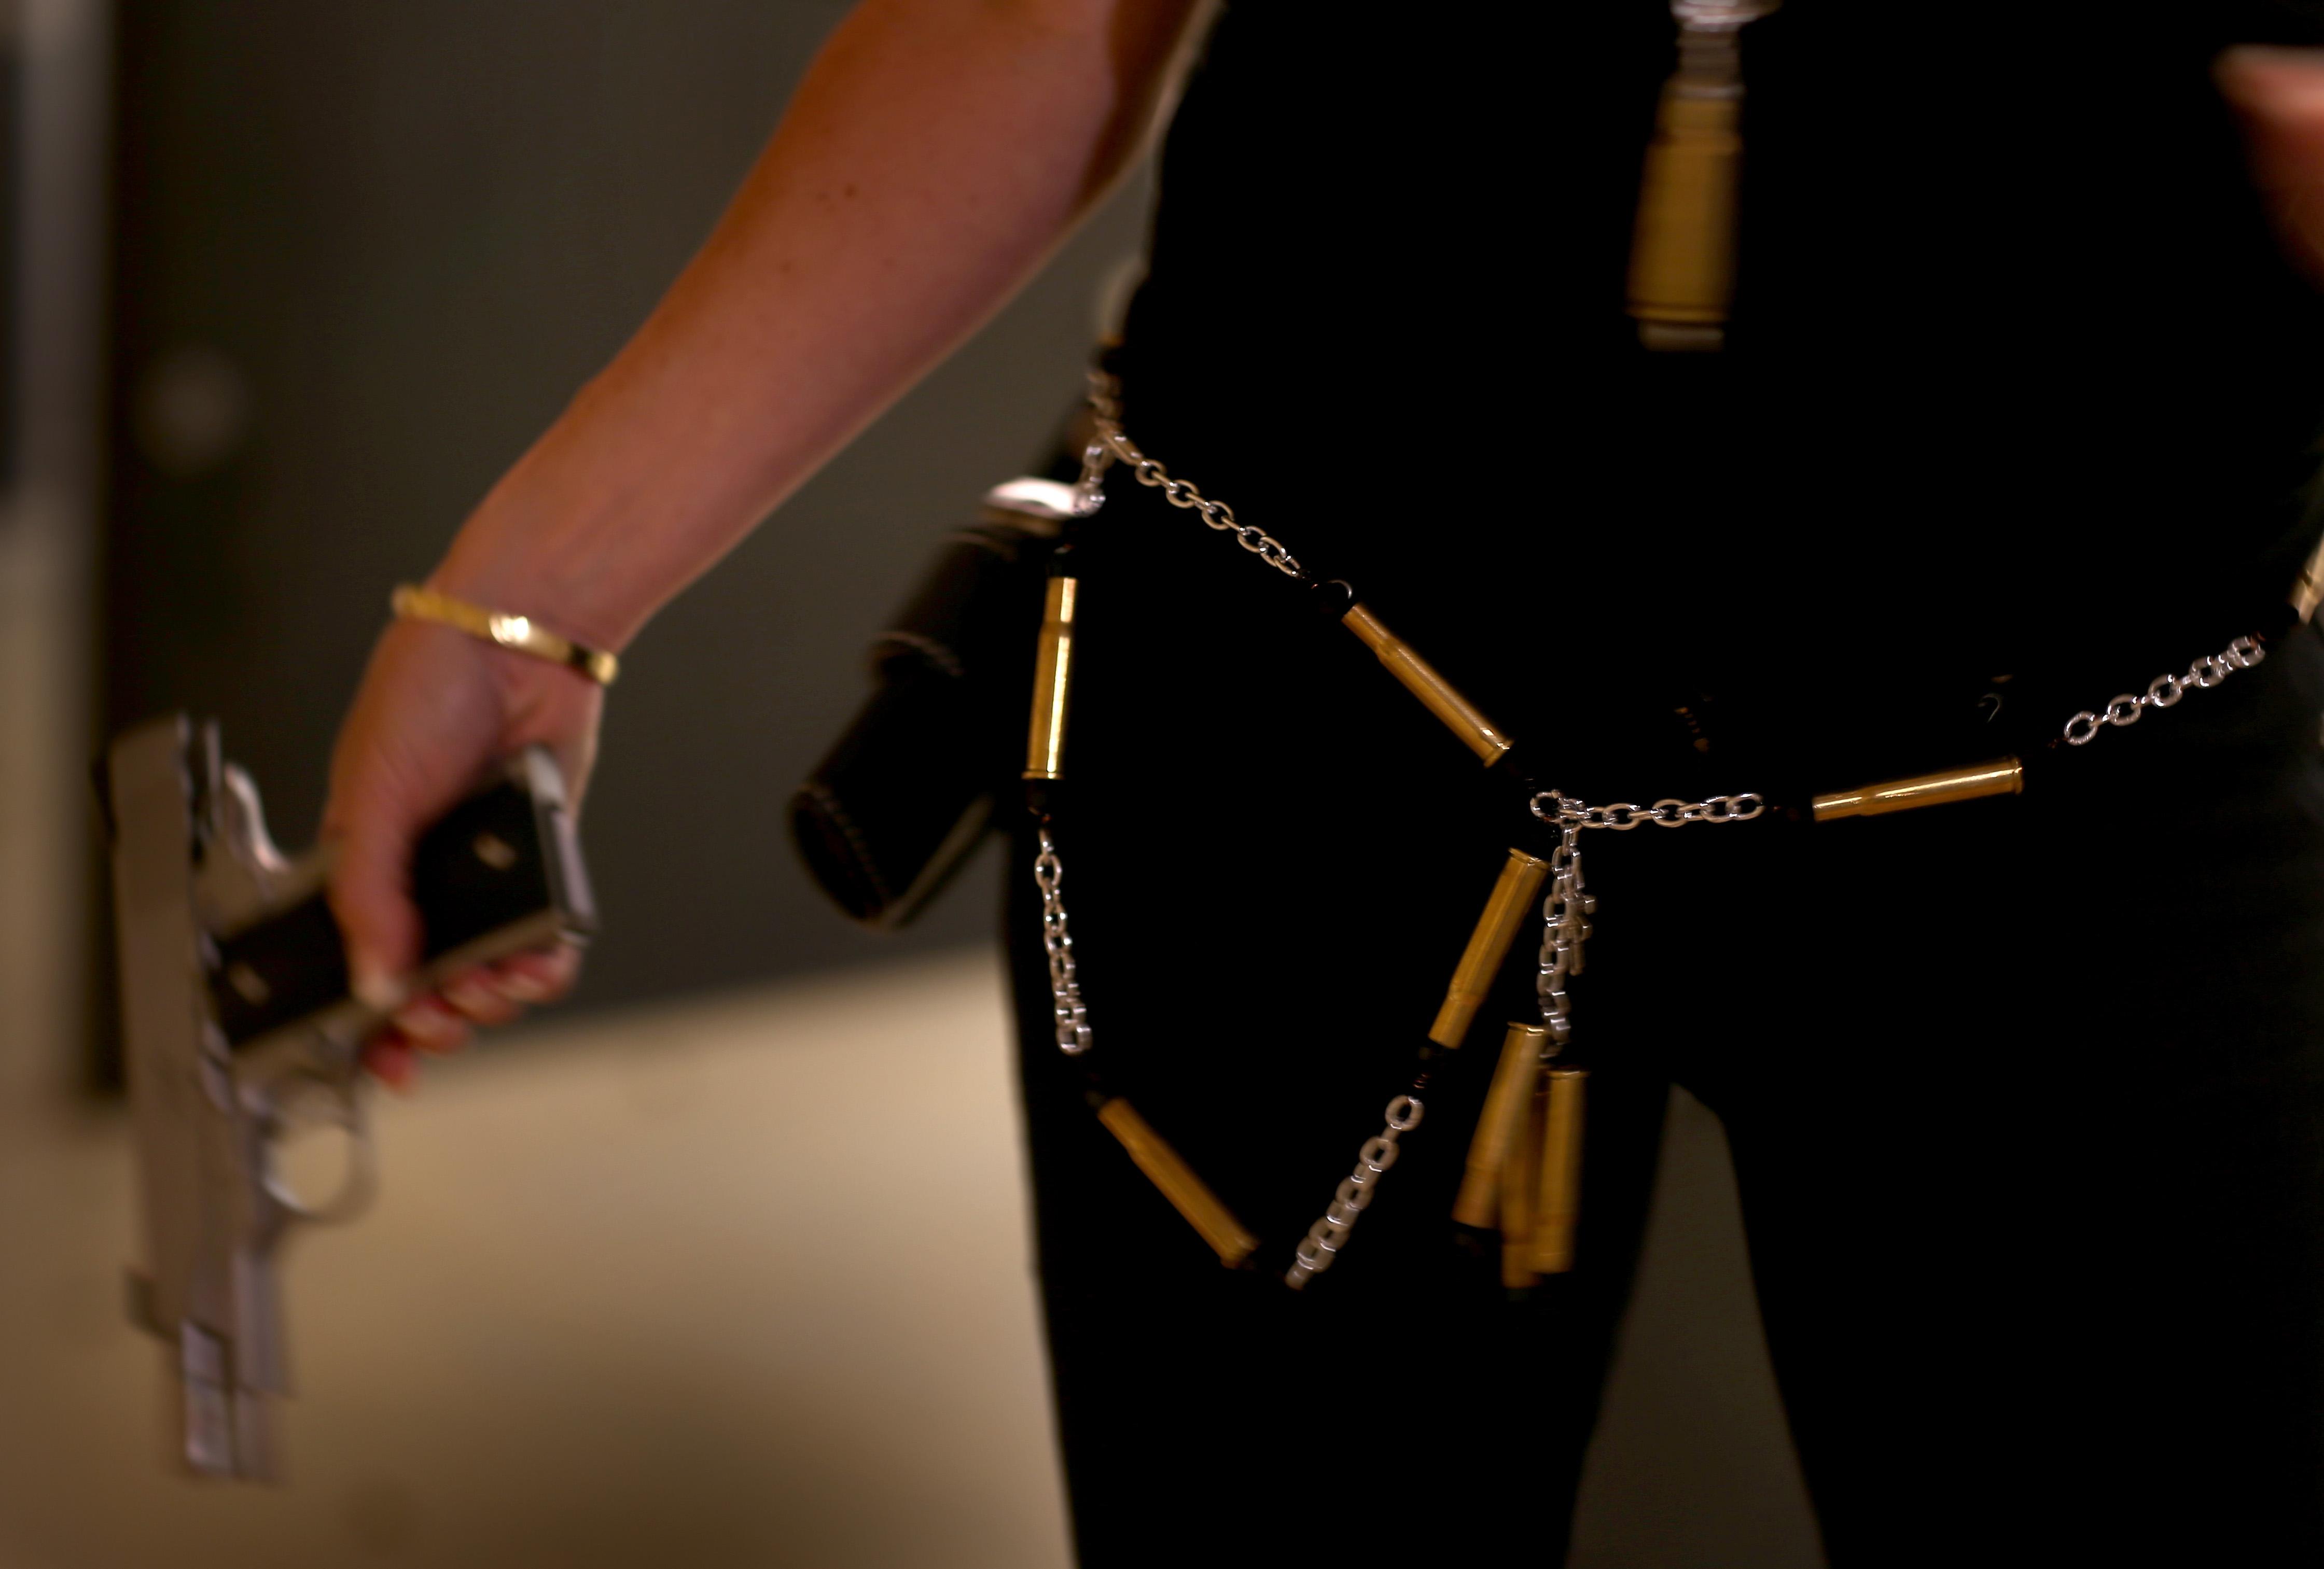 Florida Entrepreneur Creates Gun Fashion Line For Women